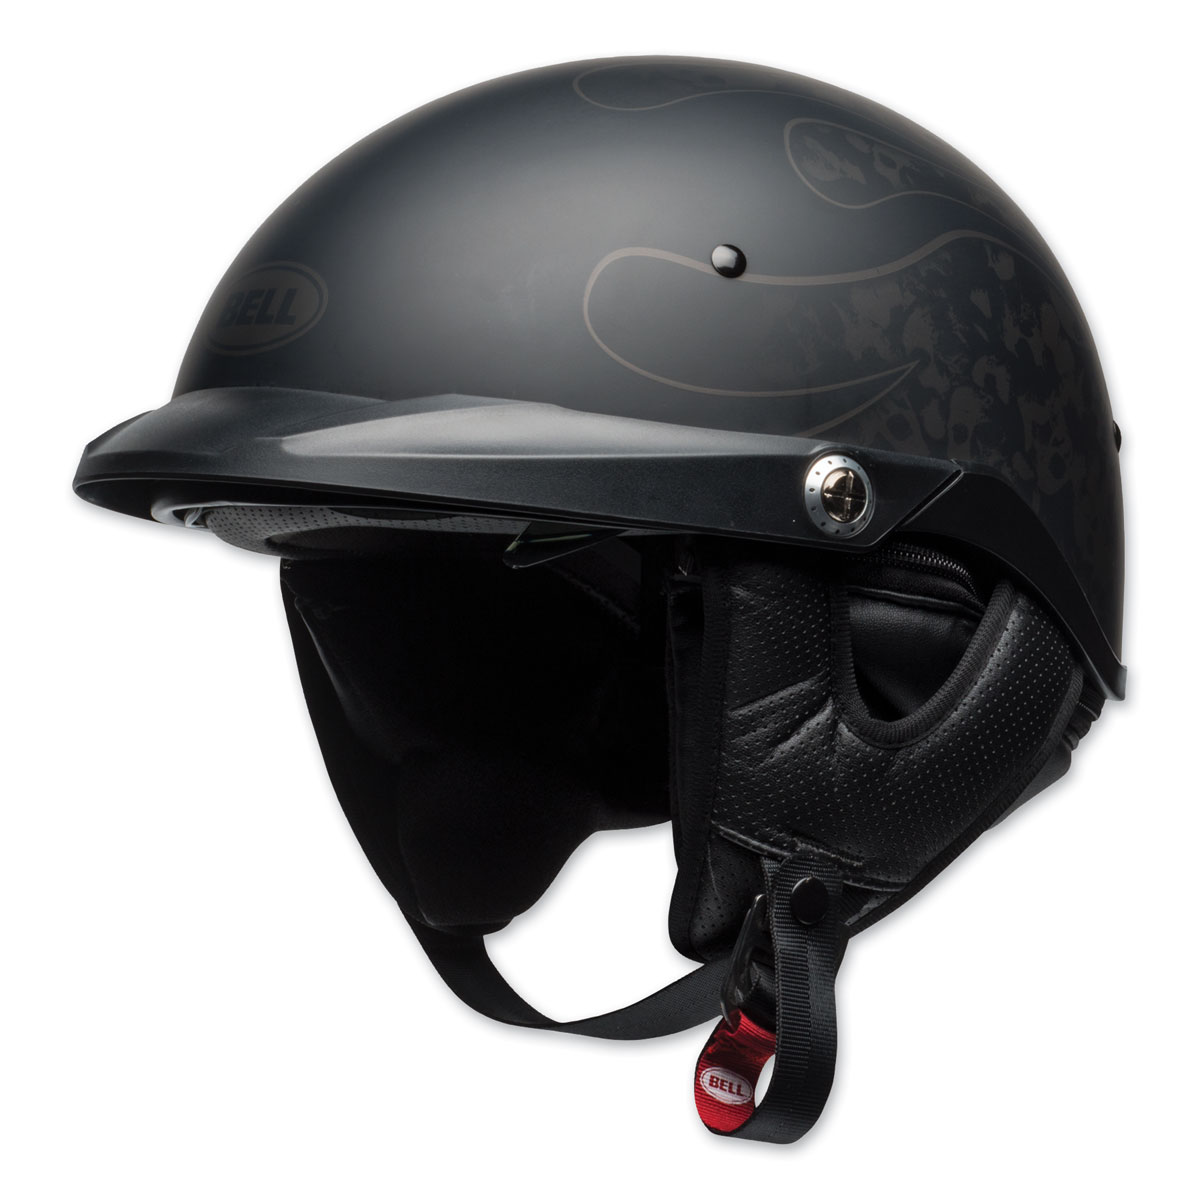 Bell Pit Boss Catacombs Half Helmet